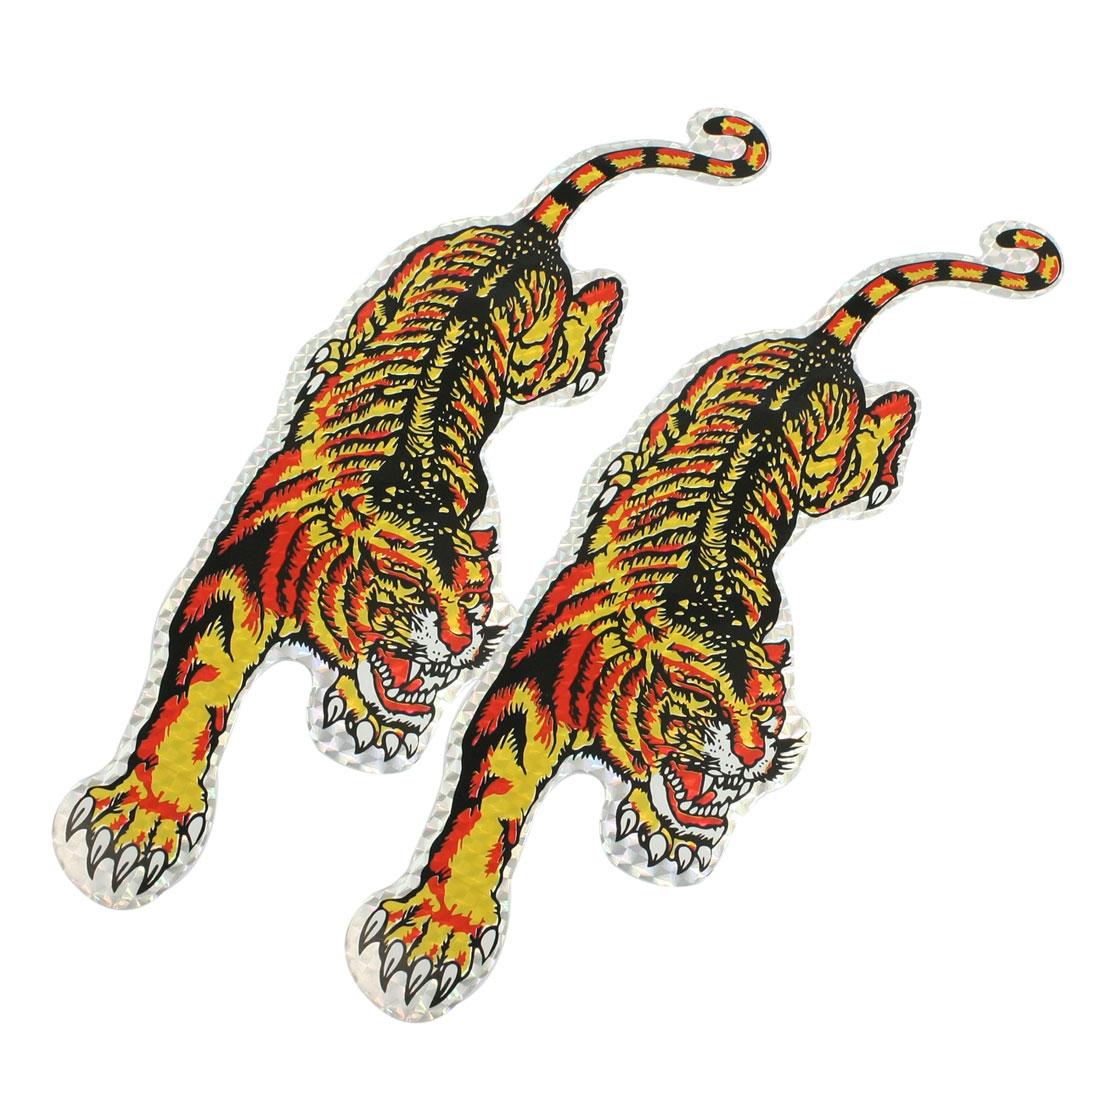 "2 Pcs Tri Color Tiger Design Blink Decal Decoration Car Sticker 11.8"" x 3.5"""